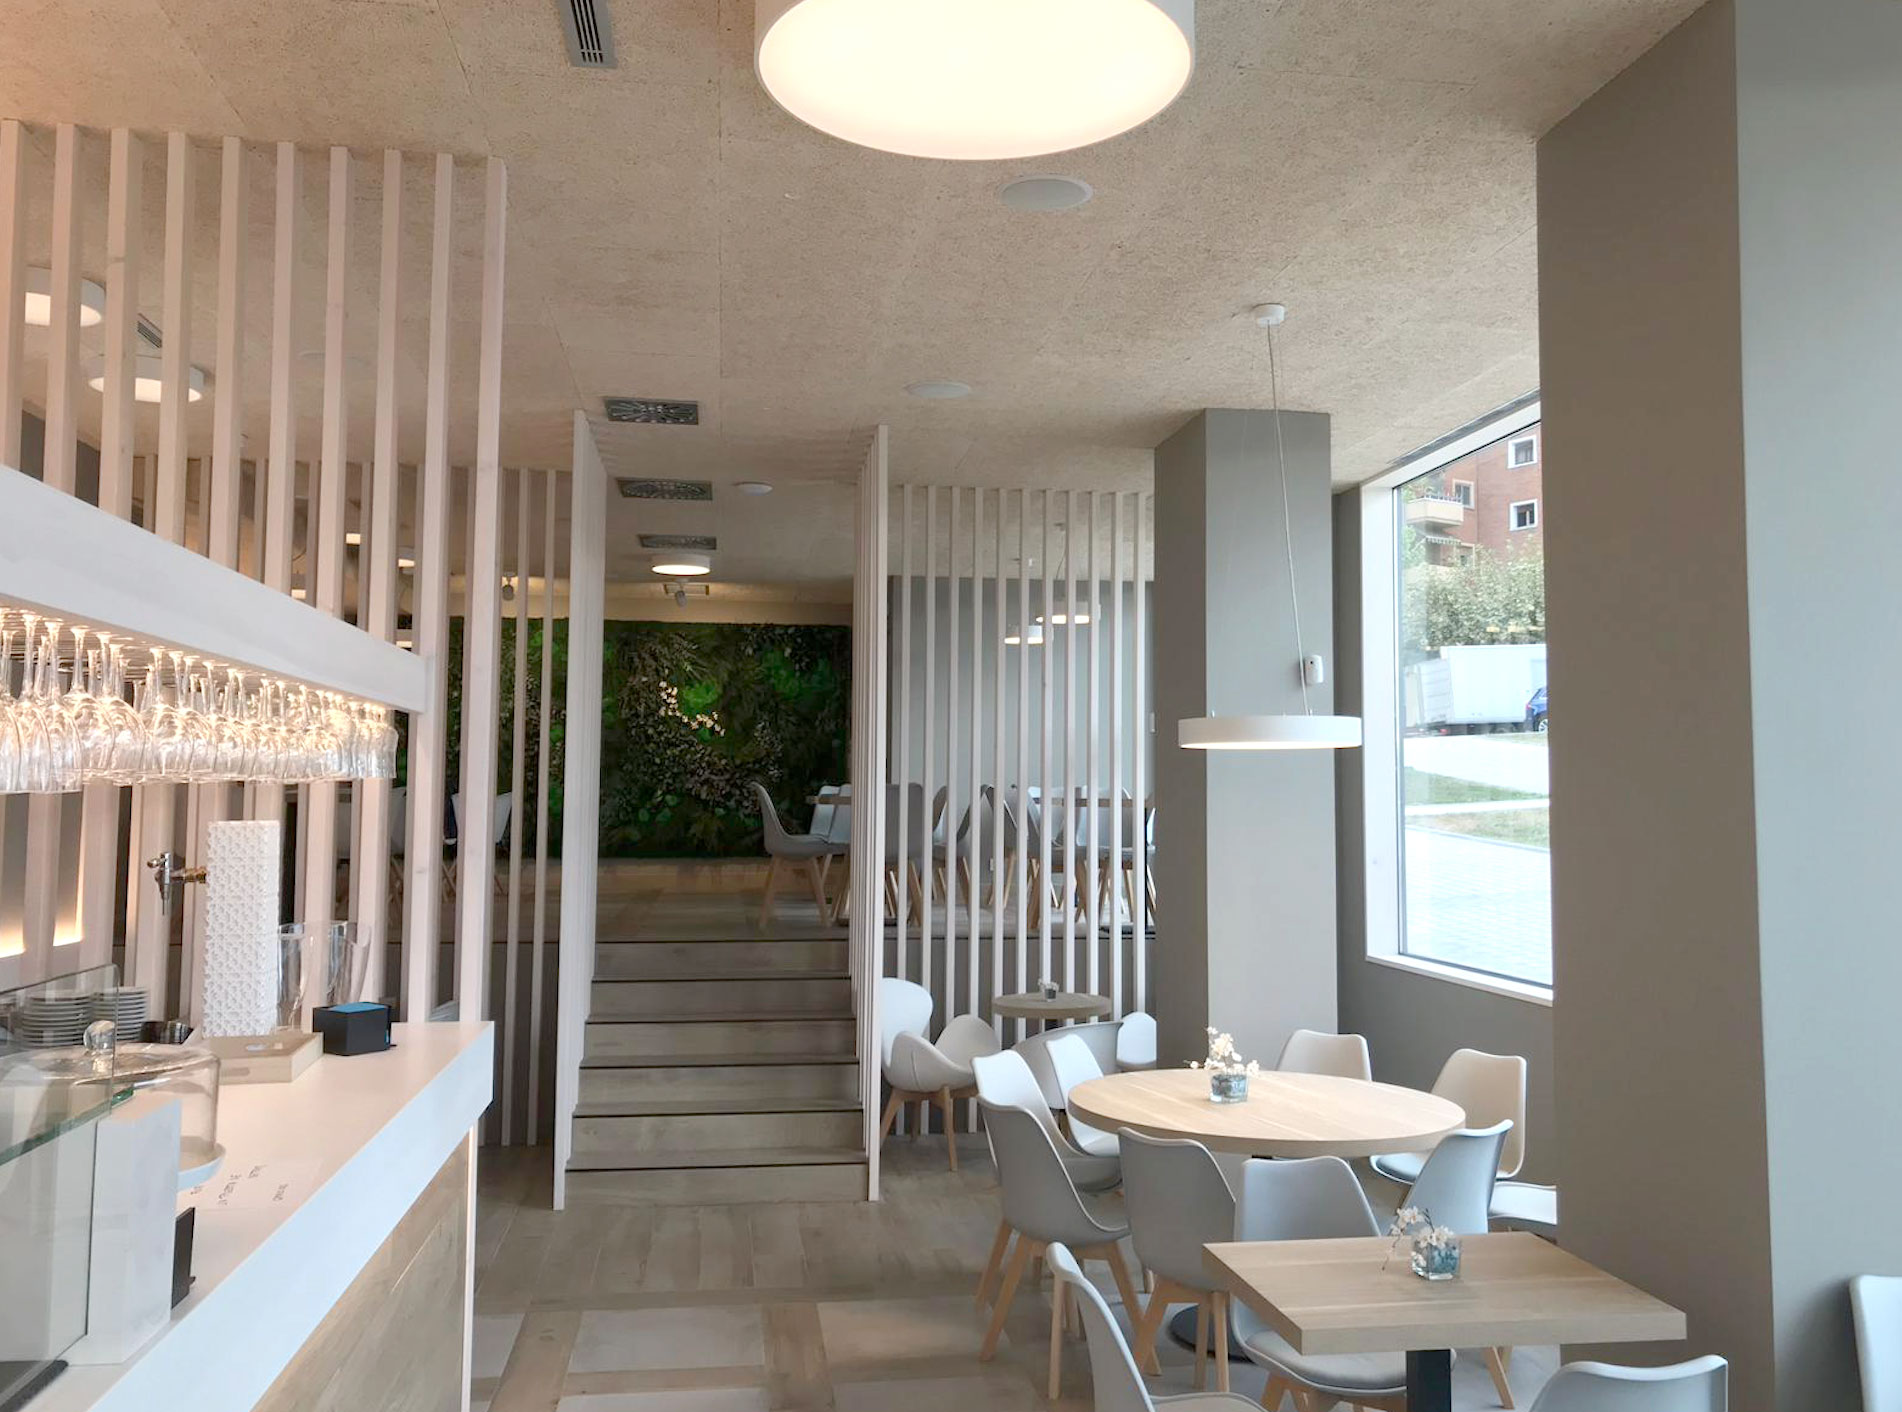 Restaurante-MON-Lezkairu-Interior